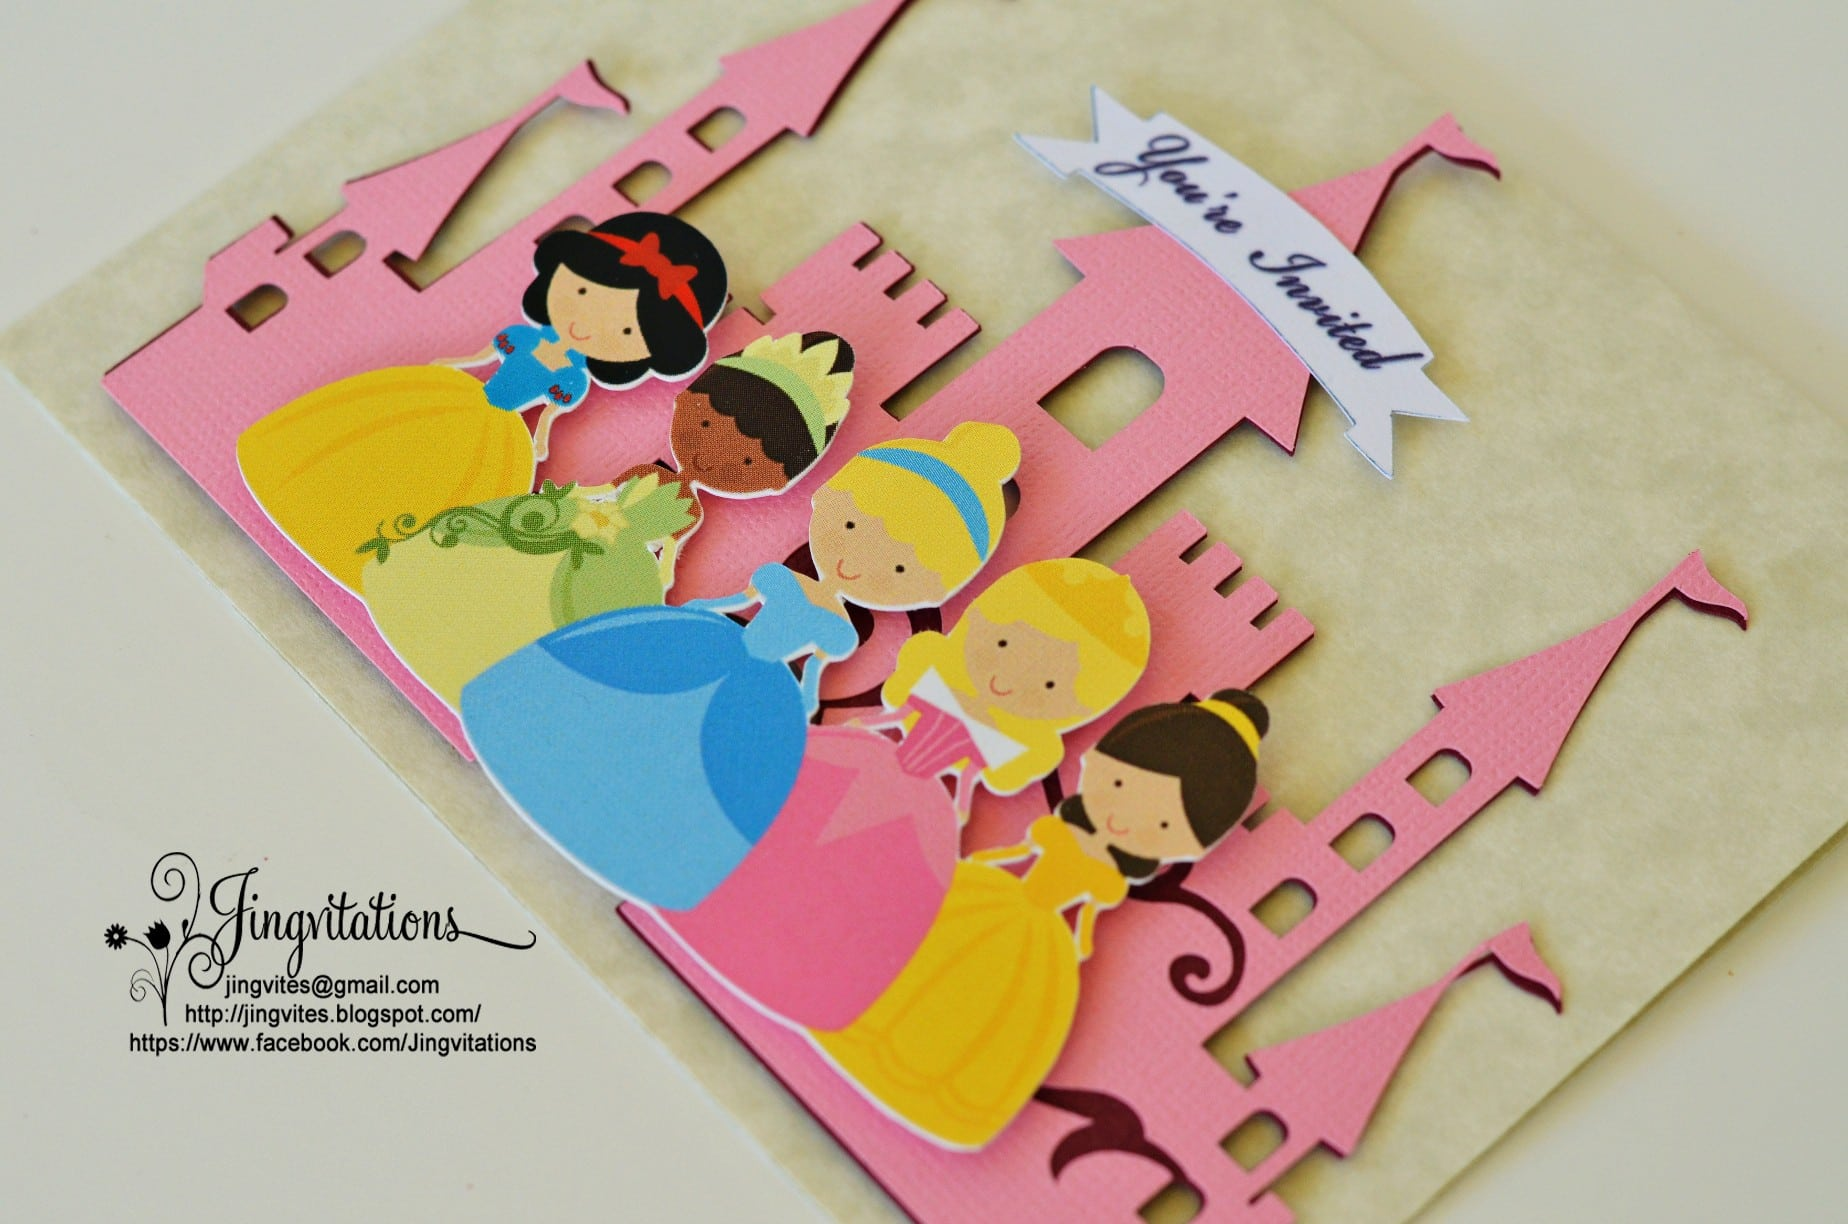 Princess Tiana Birthday Invitations Printable 3 400 X 264 640 424 1848 1224